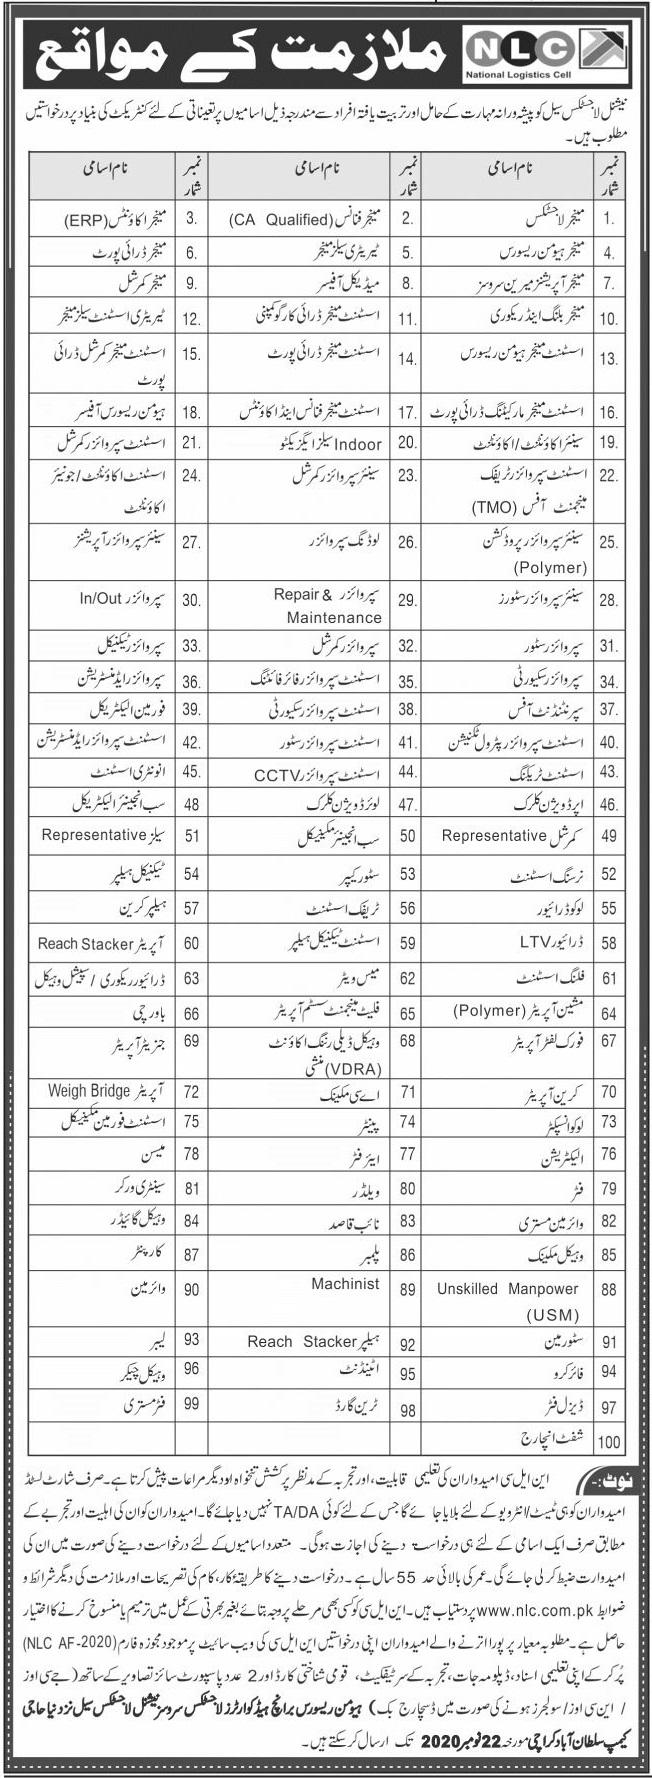 National Logistic Cell NLC November 2020 Jobs in Pakistan 2020 - Download Job Application Form - www.nlc.com.pk